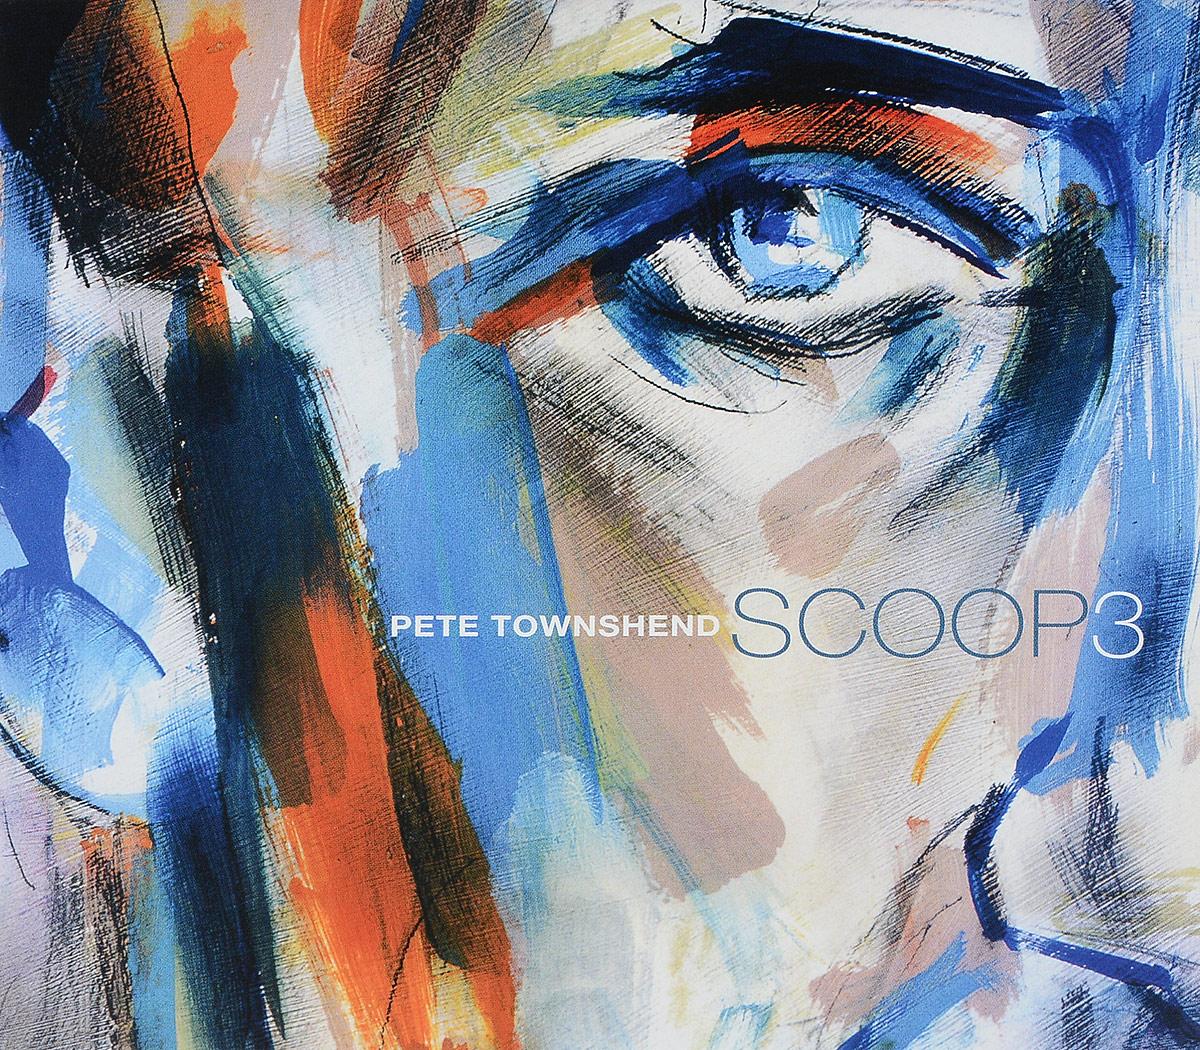 Пит Тауншенд Pete Townshend. Another Scoop цена 2017